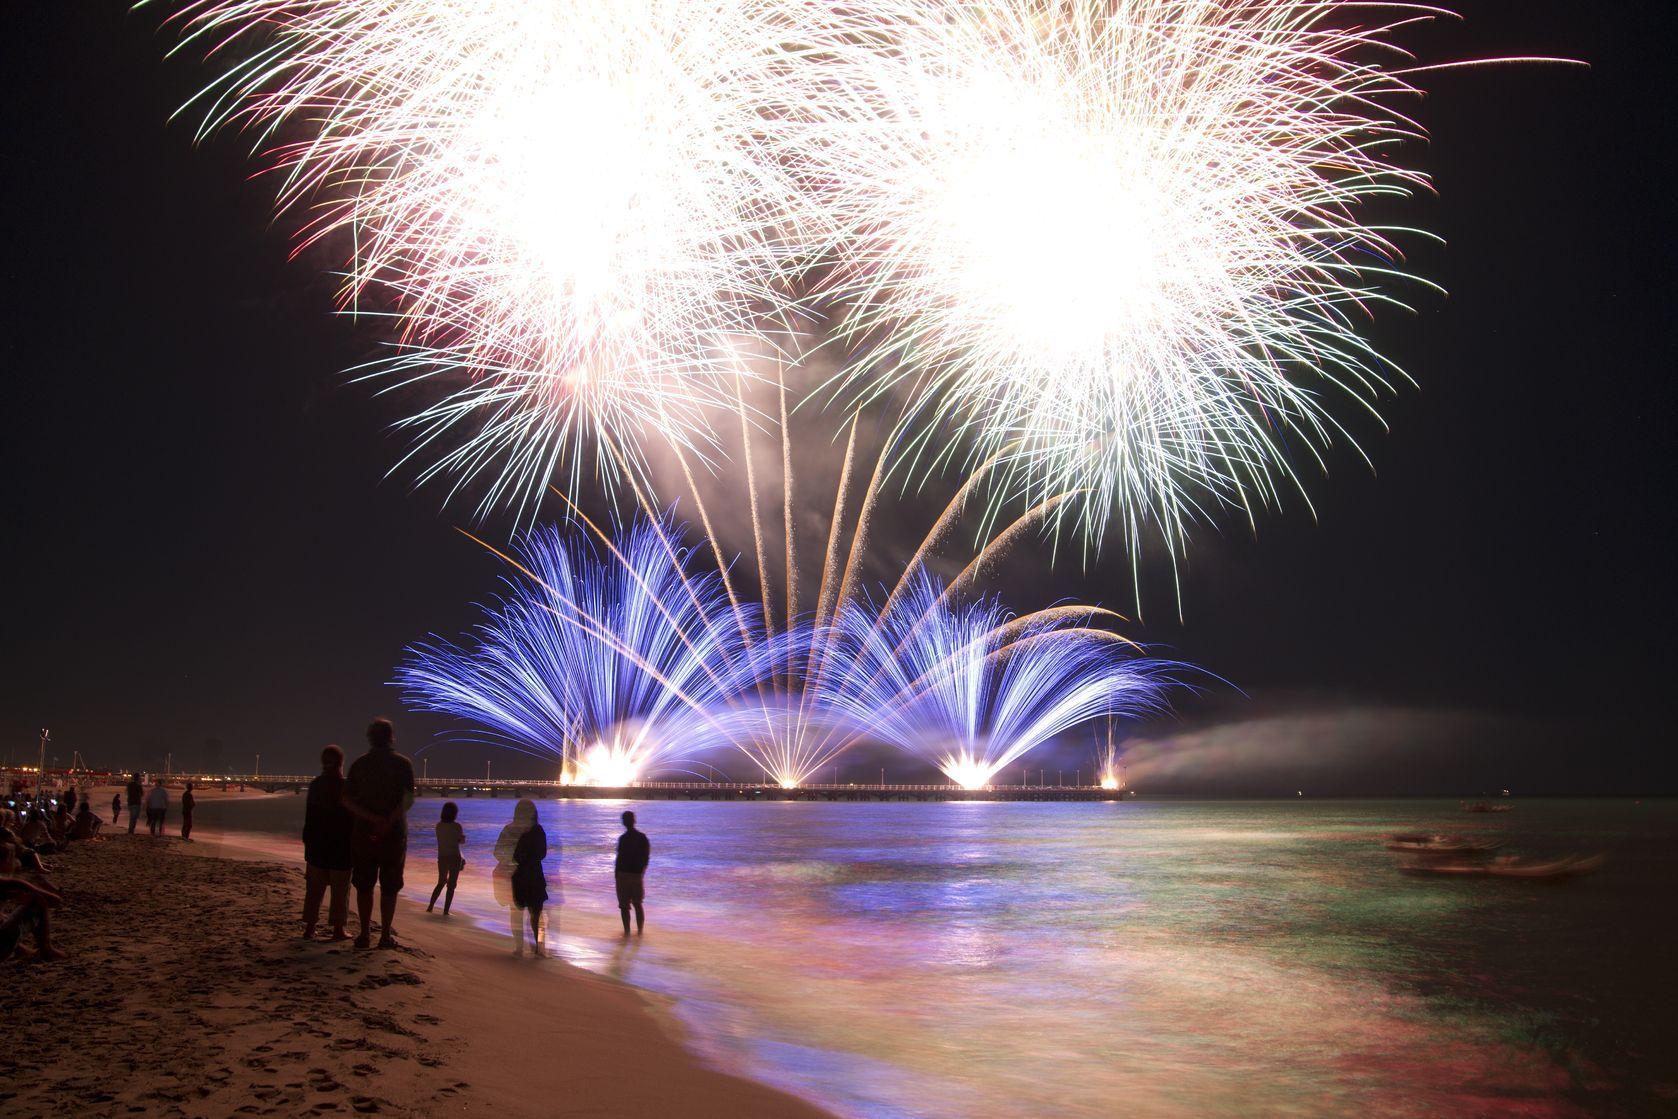 Fireworks explosive spiritual symbols fireworks background